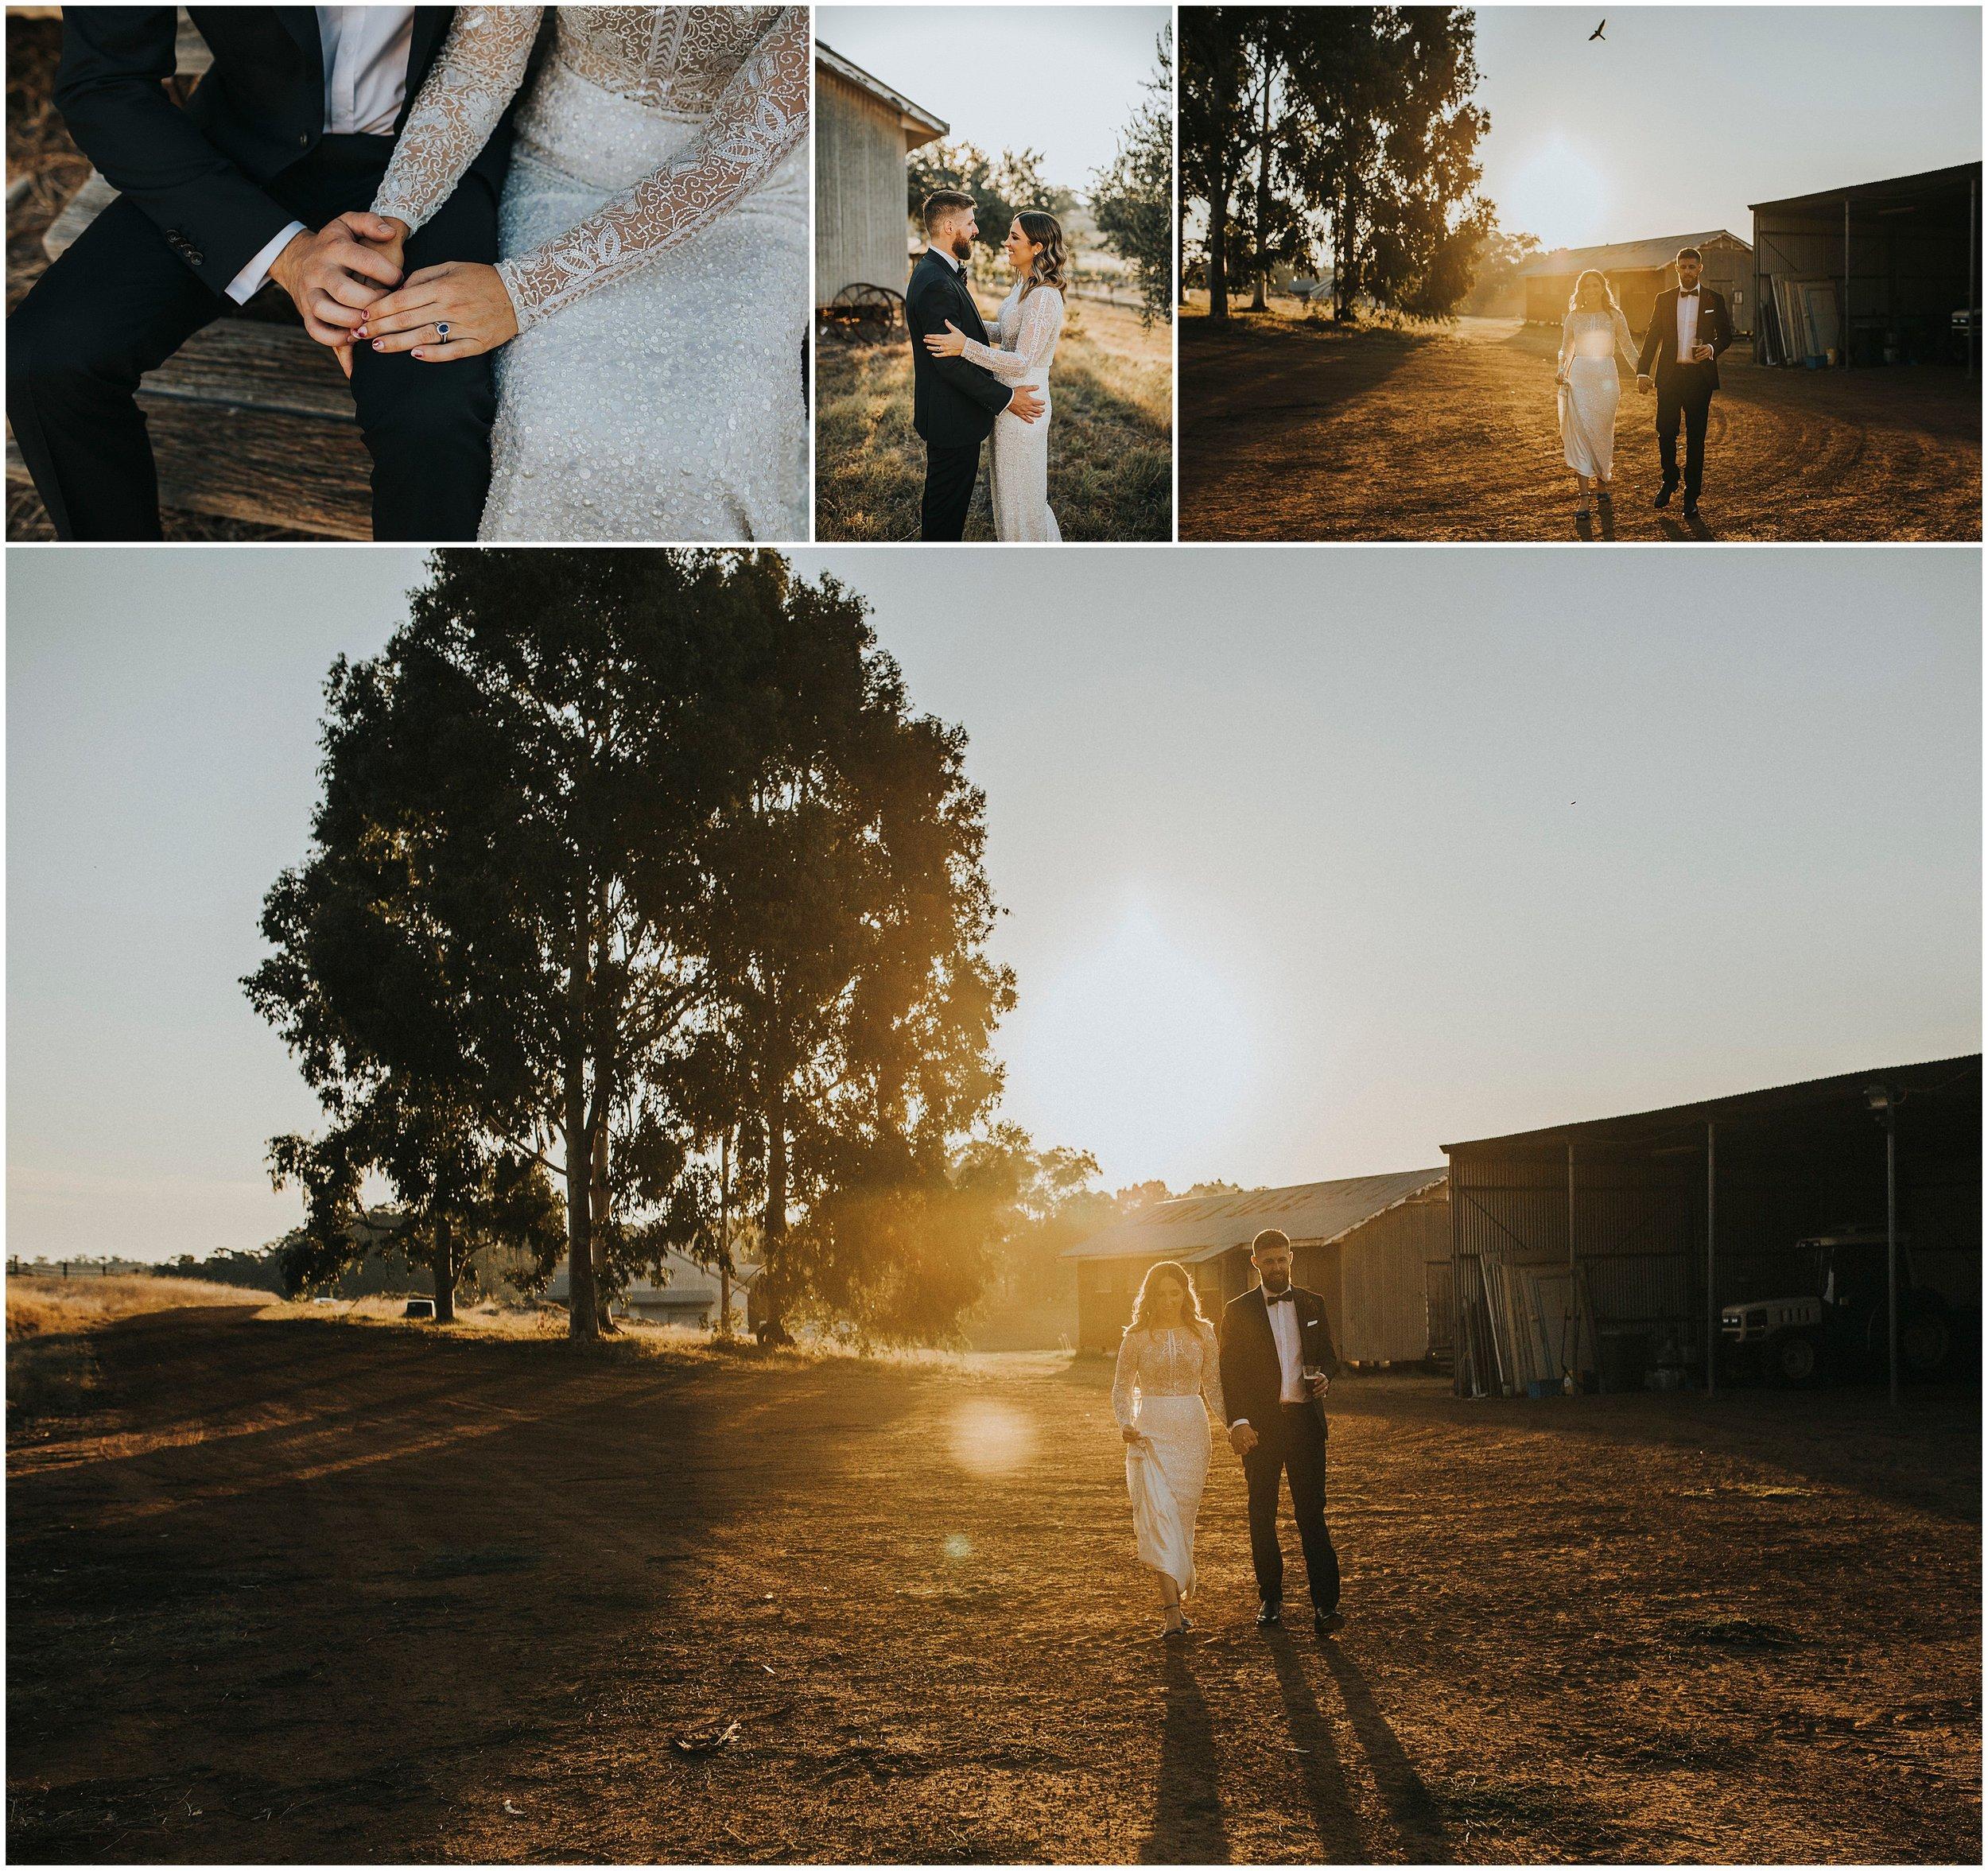 ferguson_valley_perth_wedding_photgorapher_keeper_creative_17.JPG